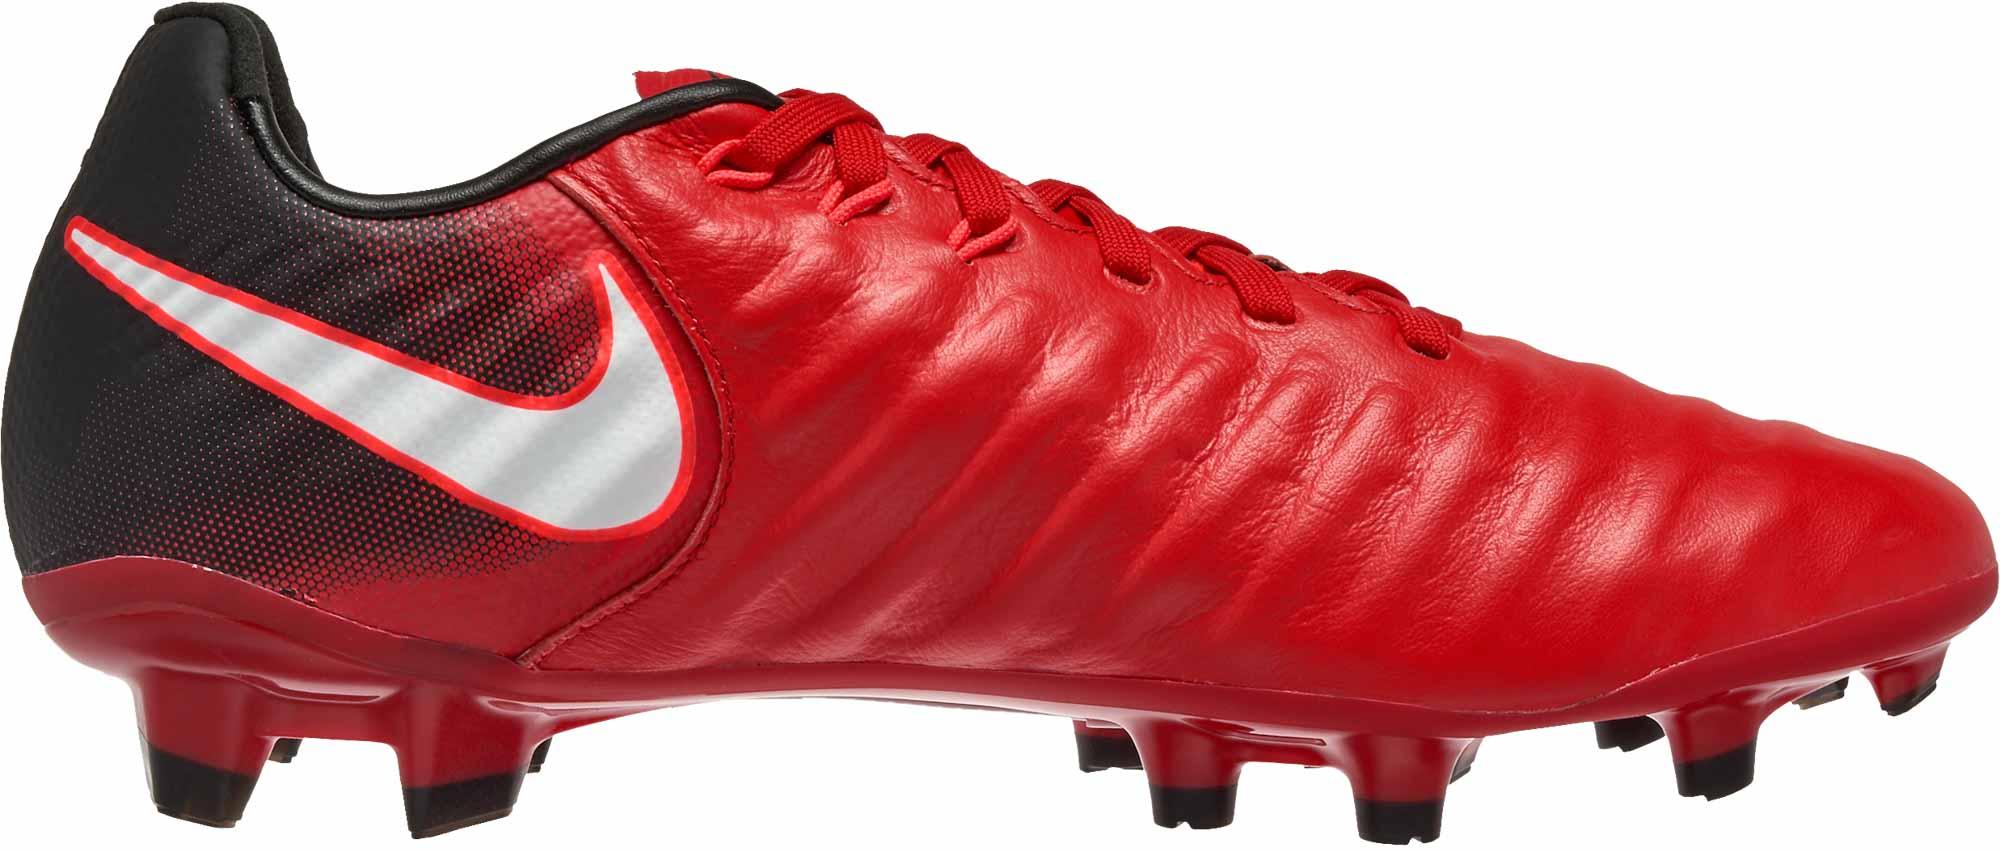 67a695627a2b Nike Kids Tiempo Legend VII FG - University Red & White - Soccer Master